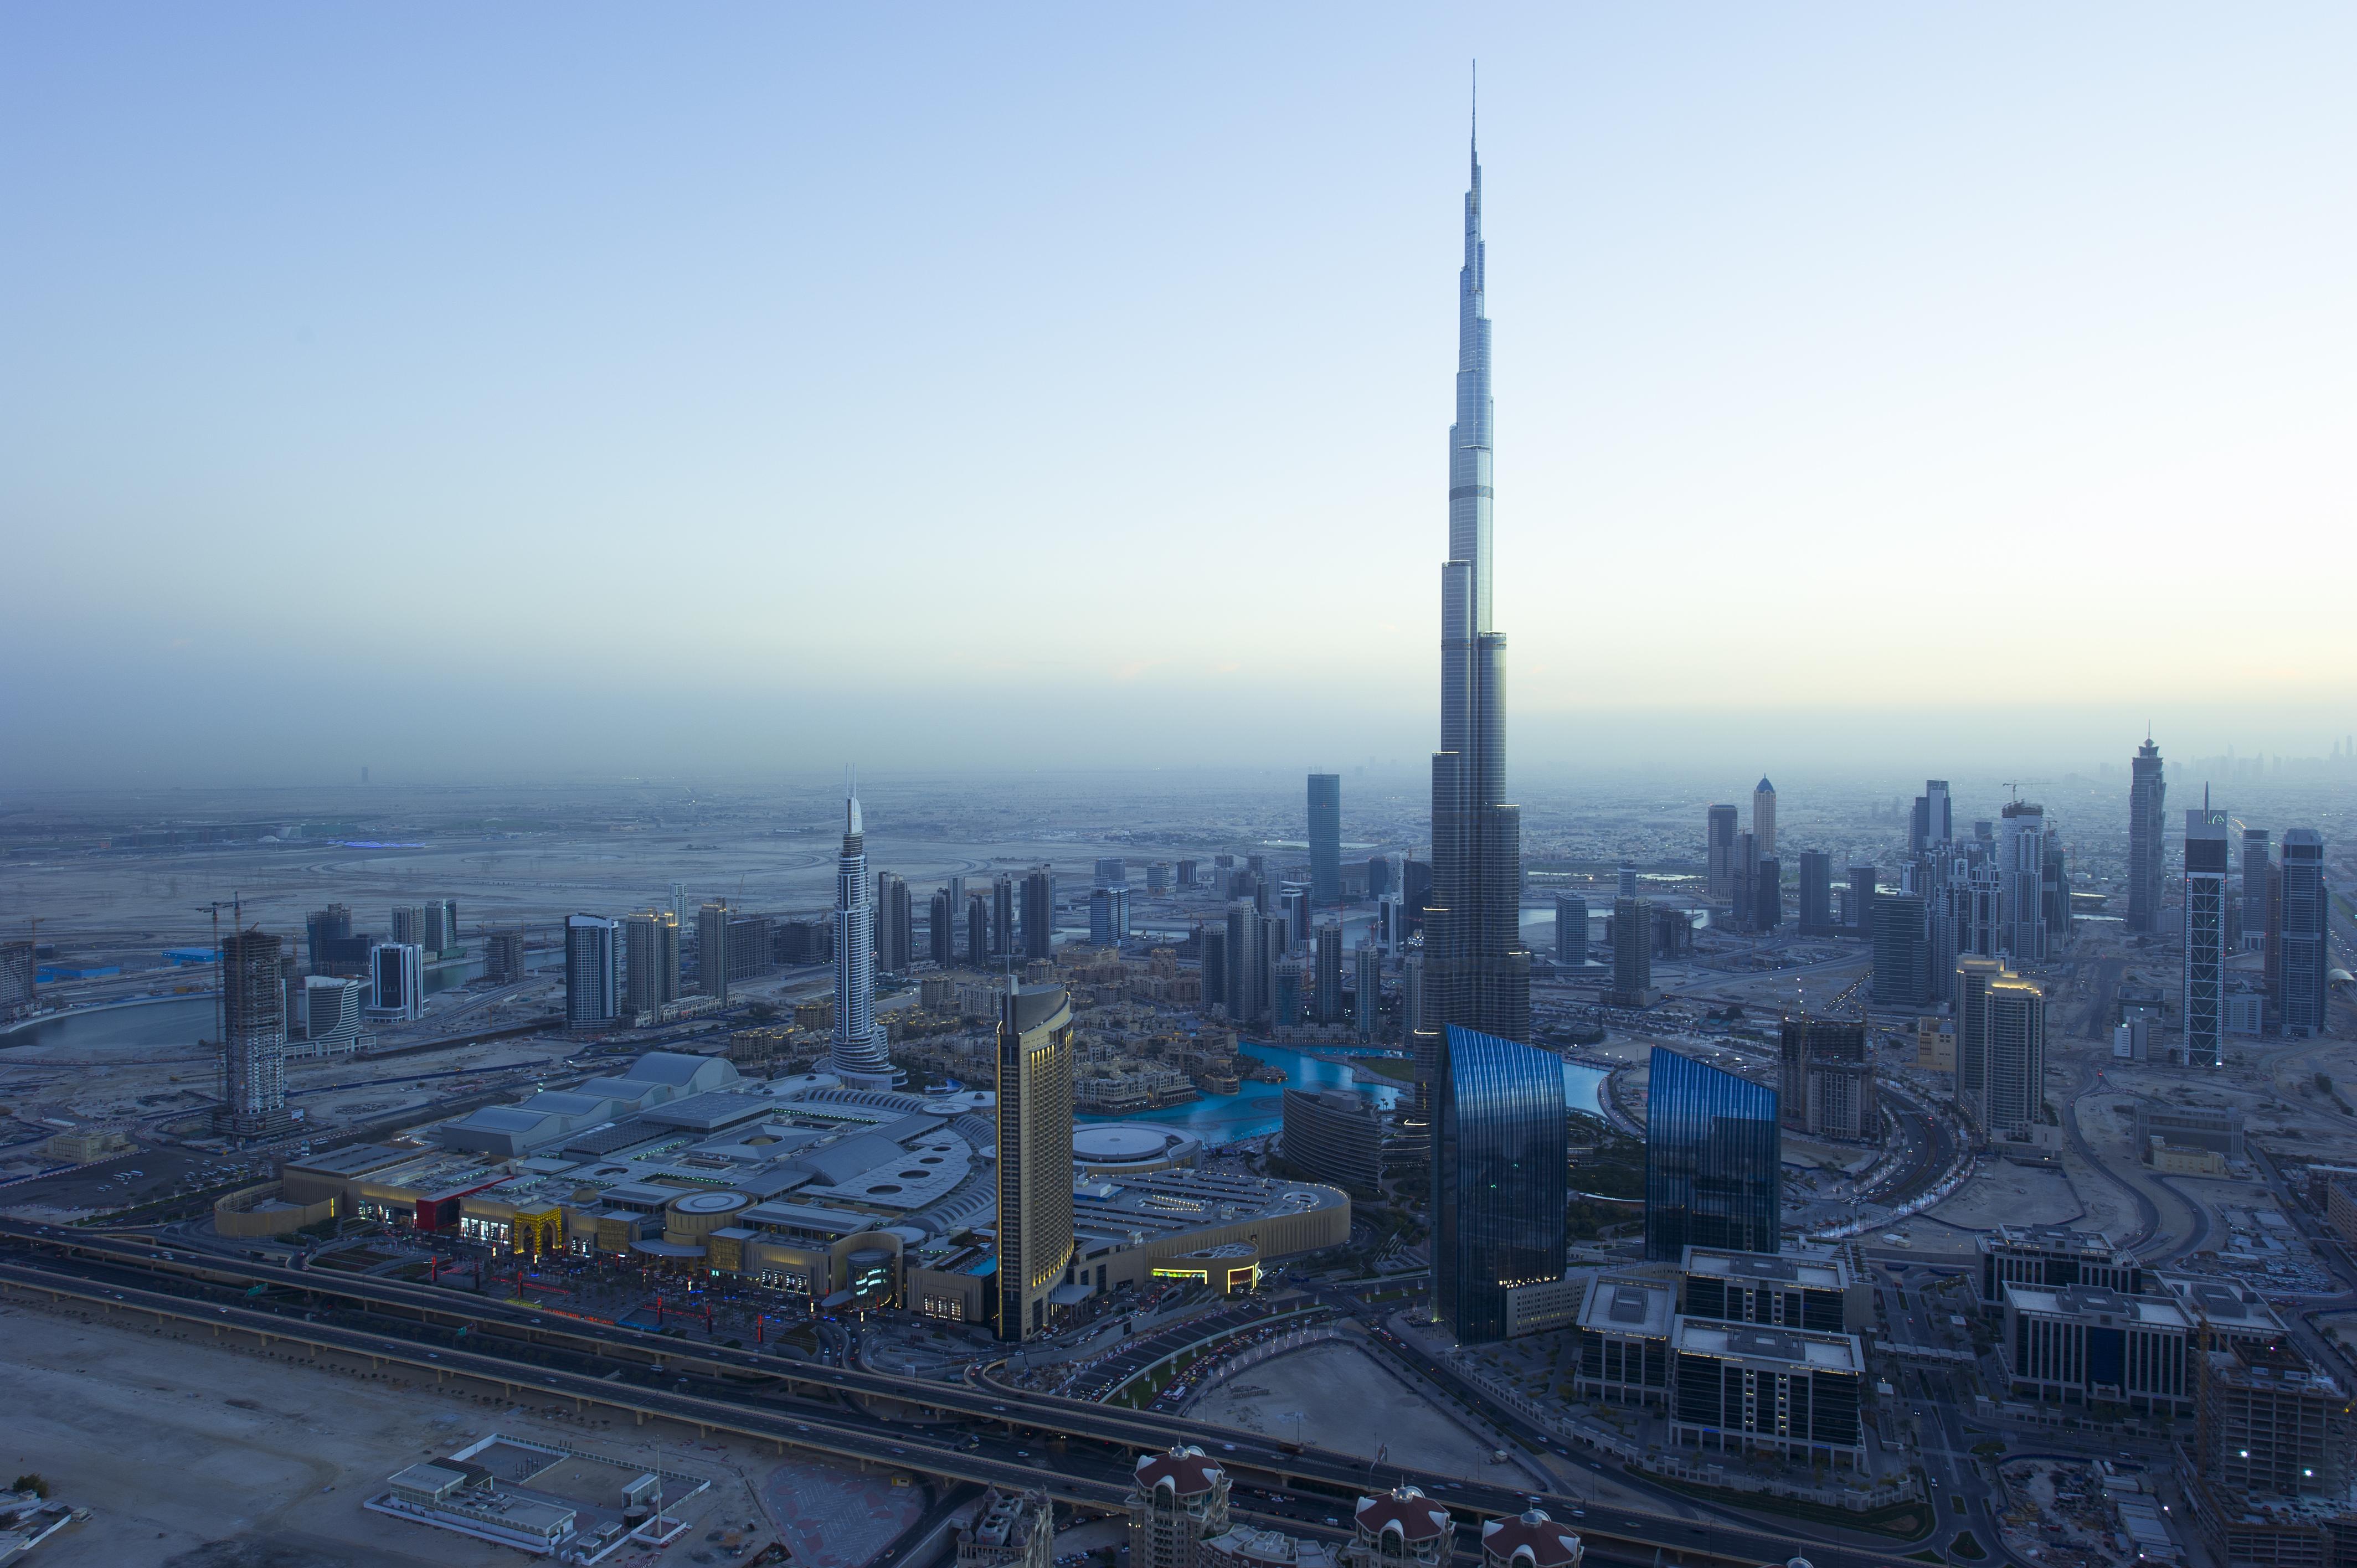 Burj Khalifa | Dubai, United Arab Emirates Attractions